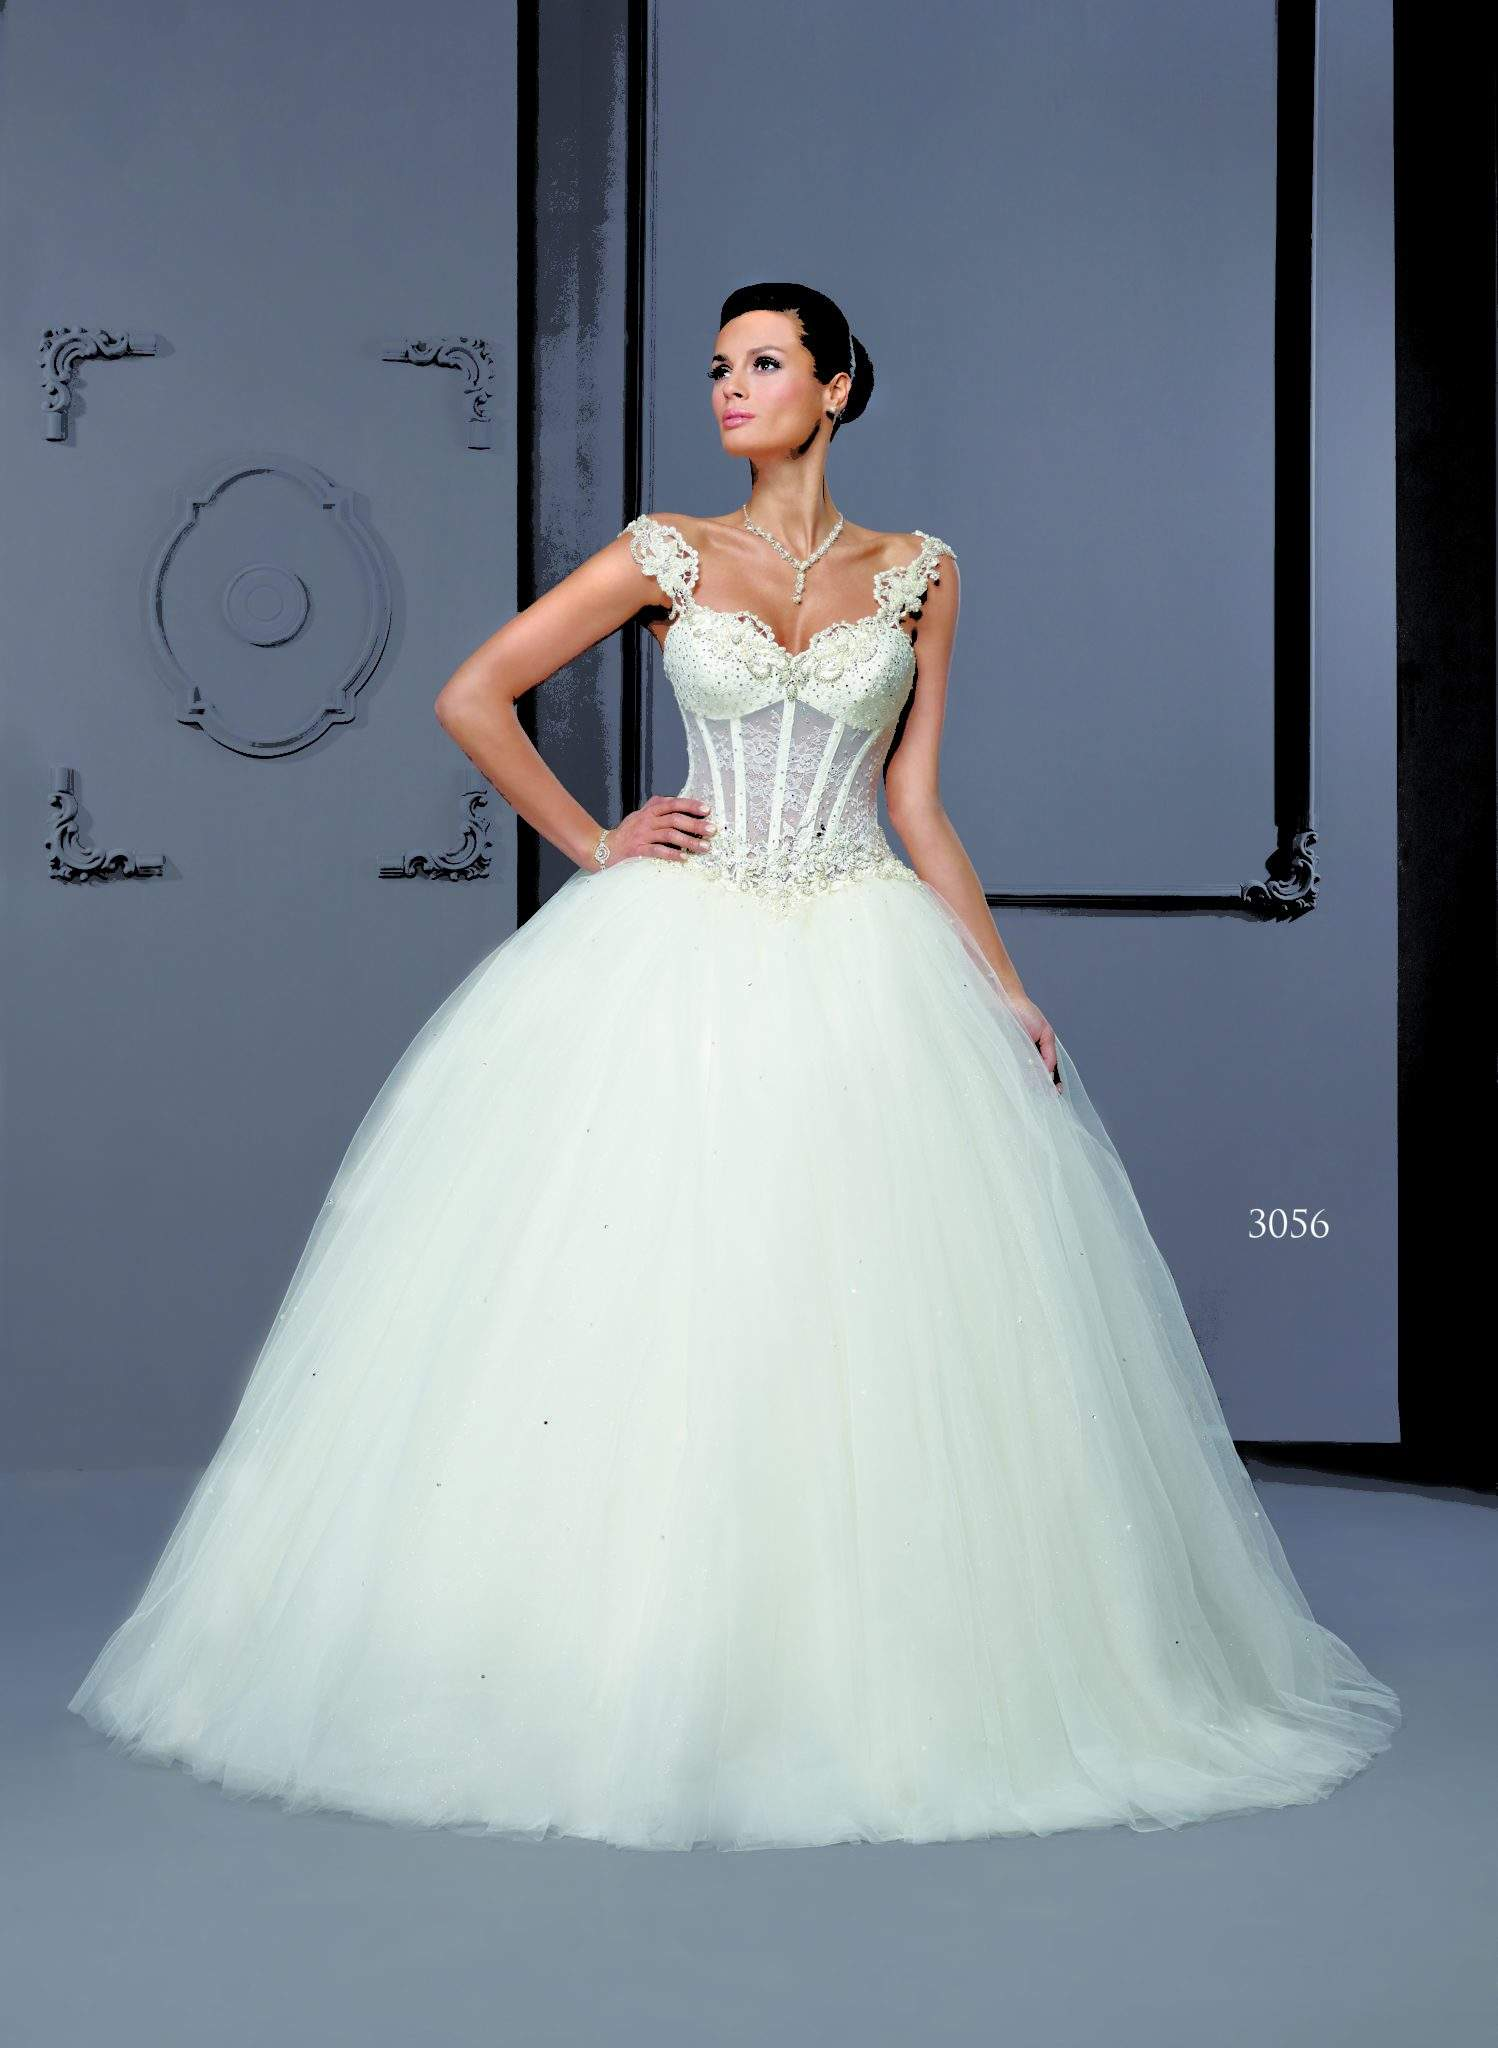 Corset Bridal Gowns - Darius Cordell Fashion Ltd